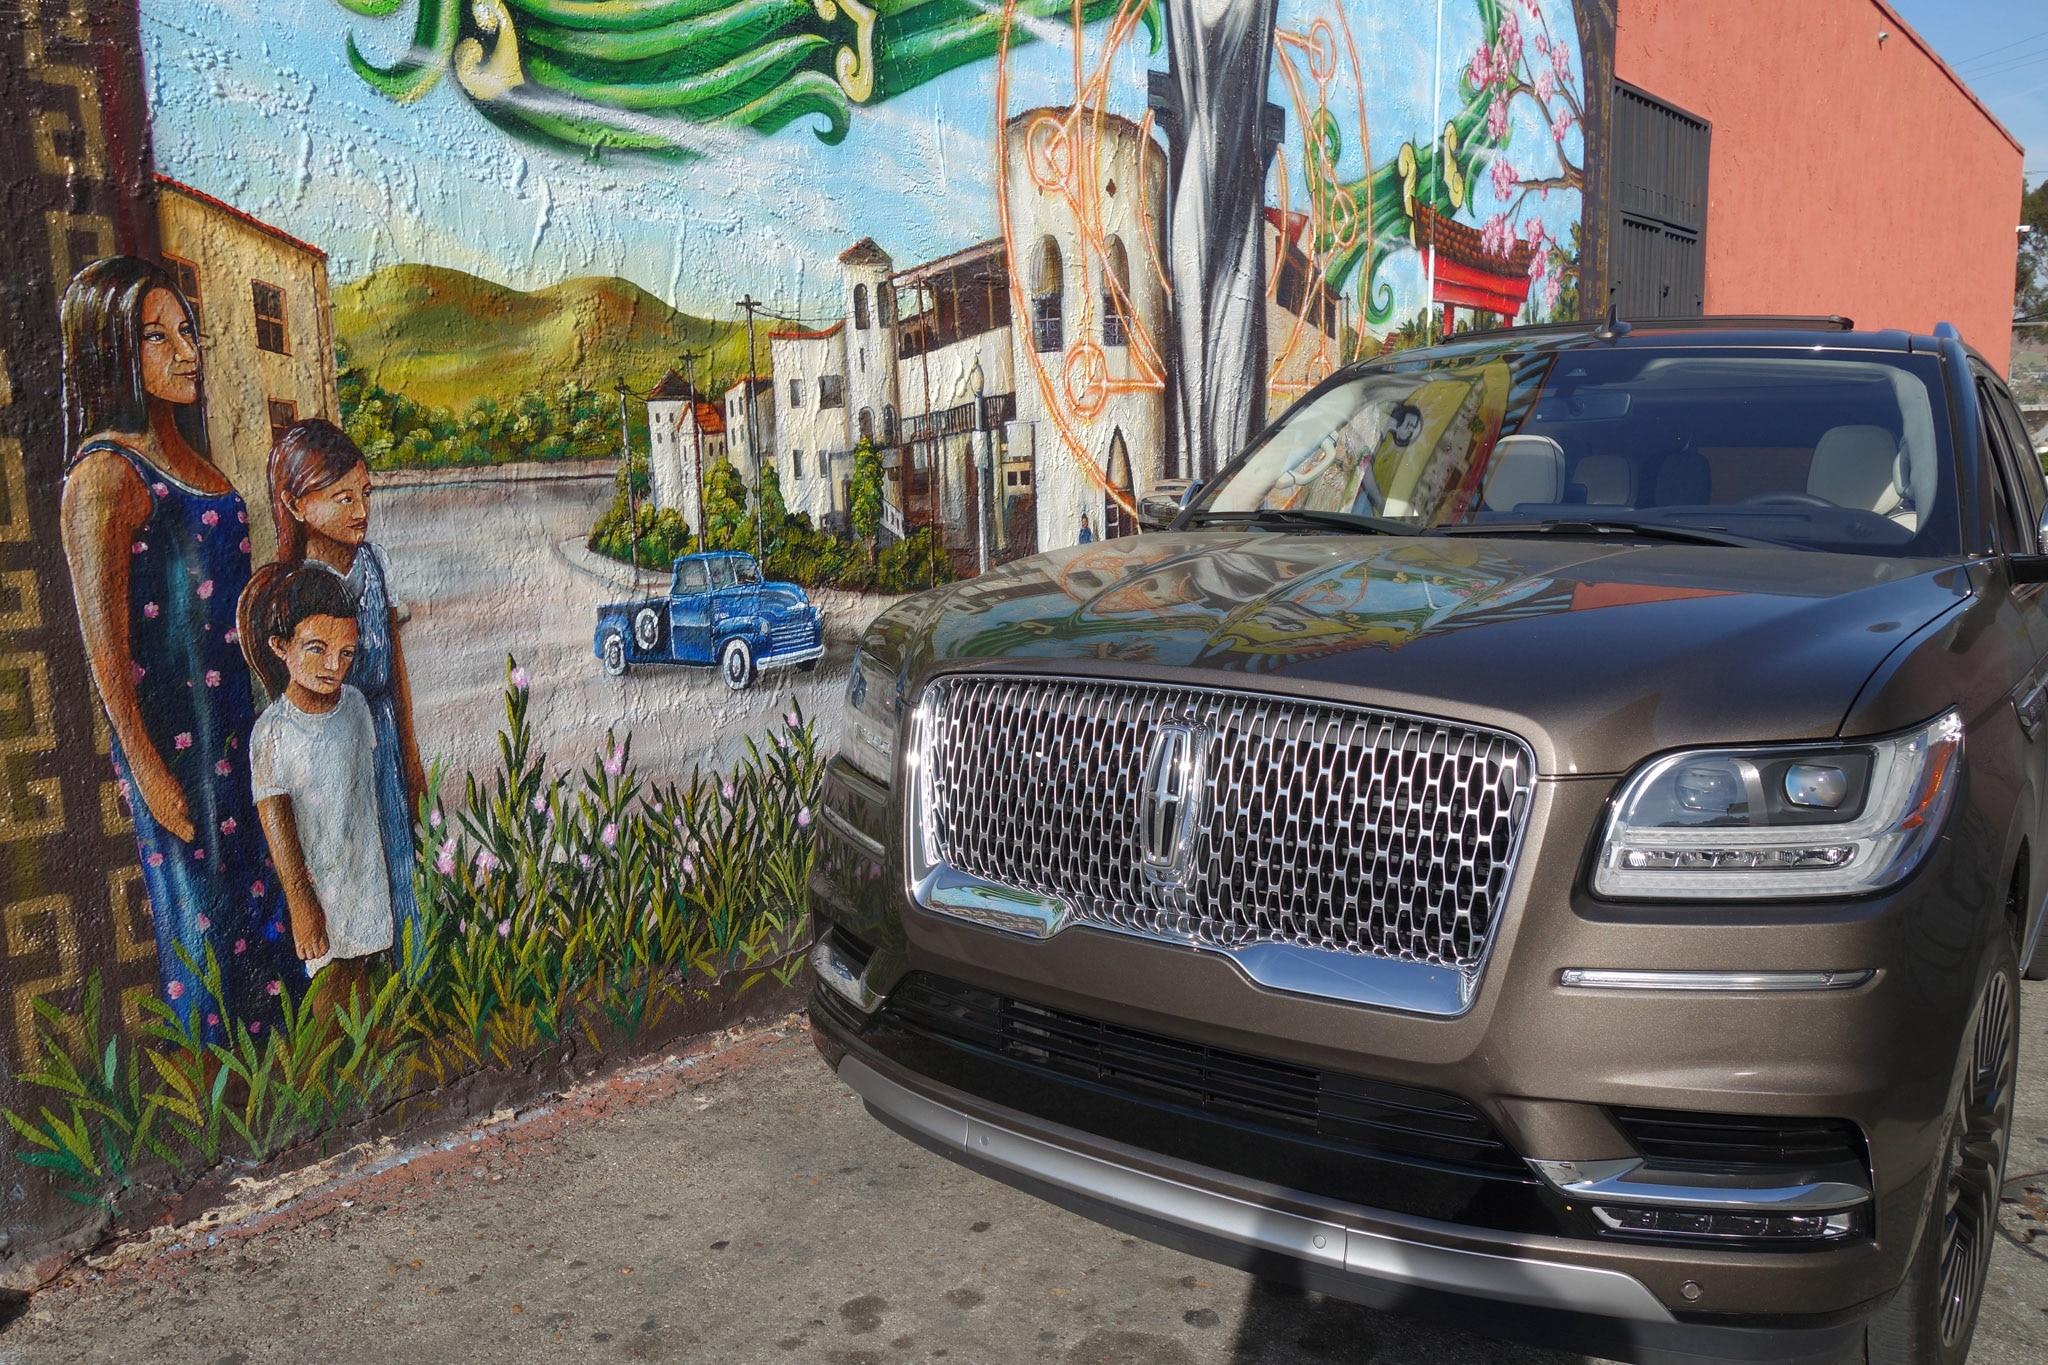 2018 Lincoln Navigator 4x4 Black Label Edition Quick Take